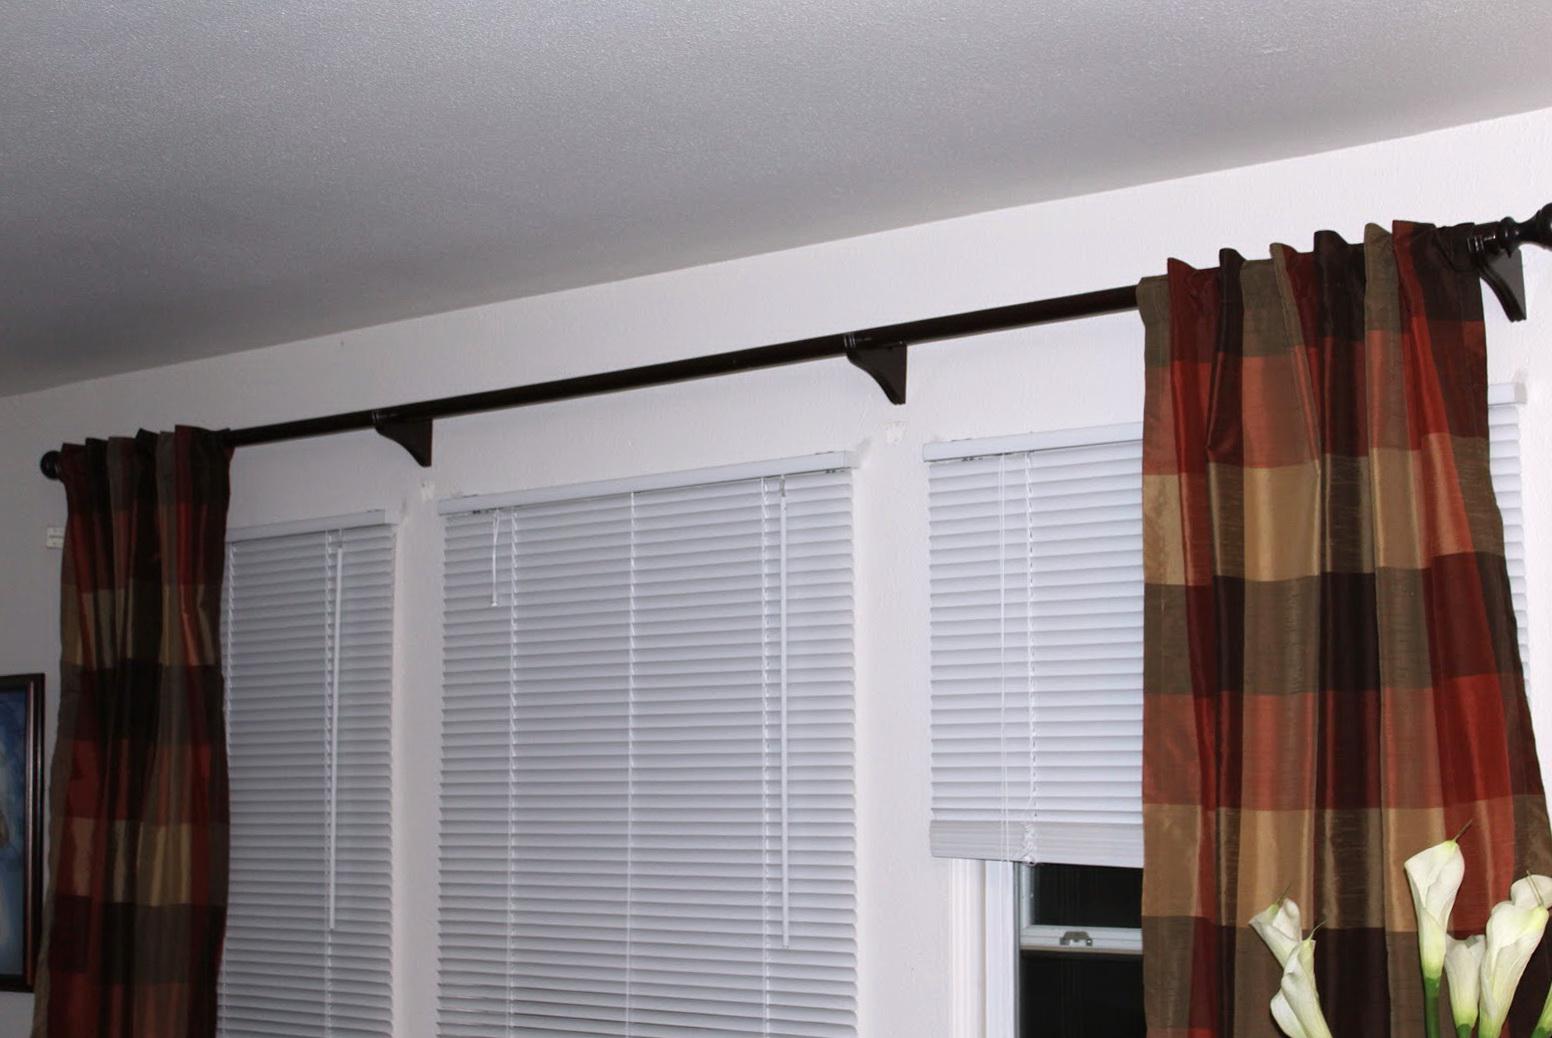 Inside Mount Curtain Ideas Cafe Curtain Rods Inside Mount Home Design Ideas Curtain Rod